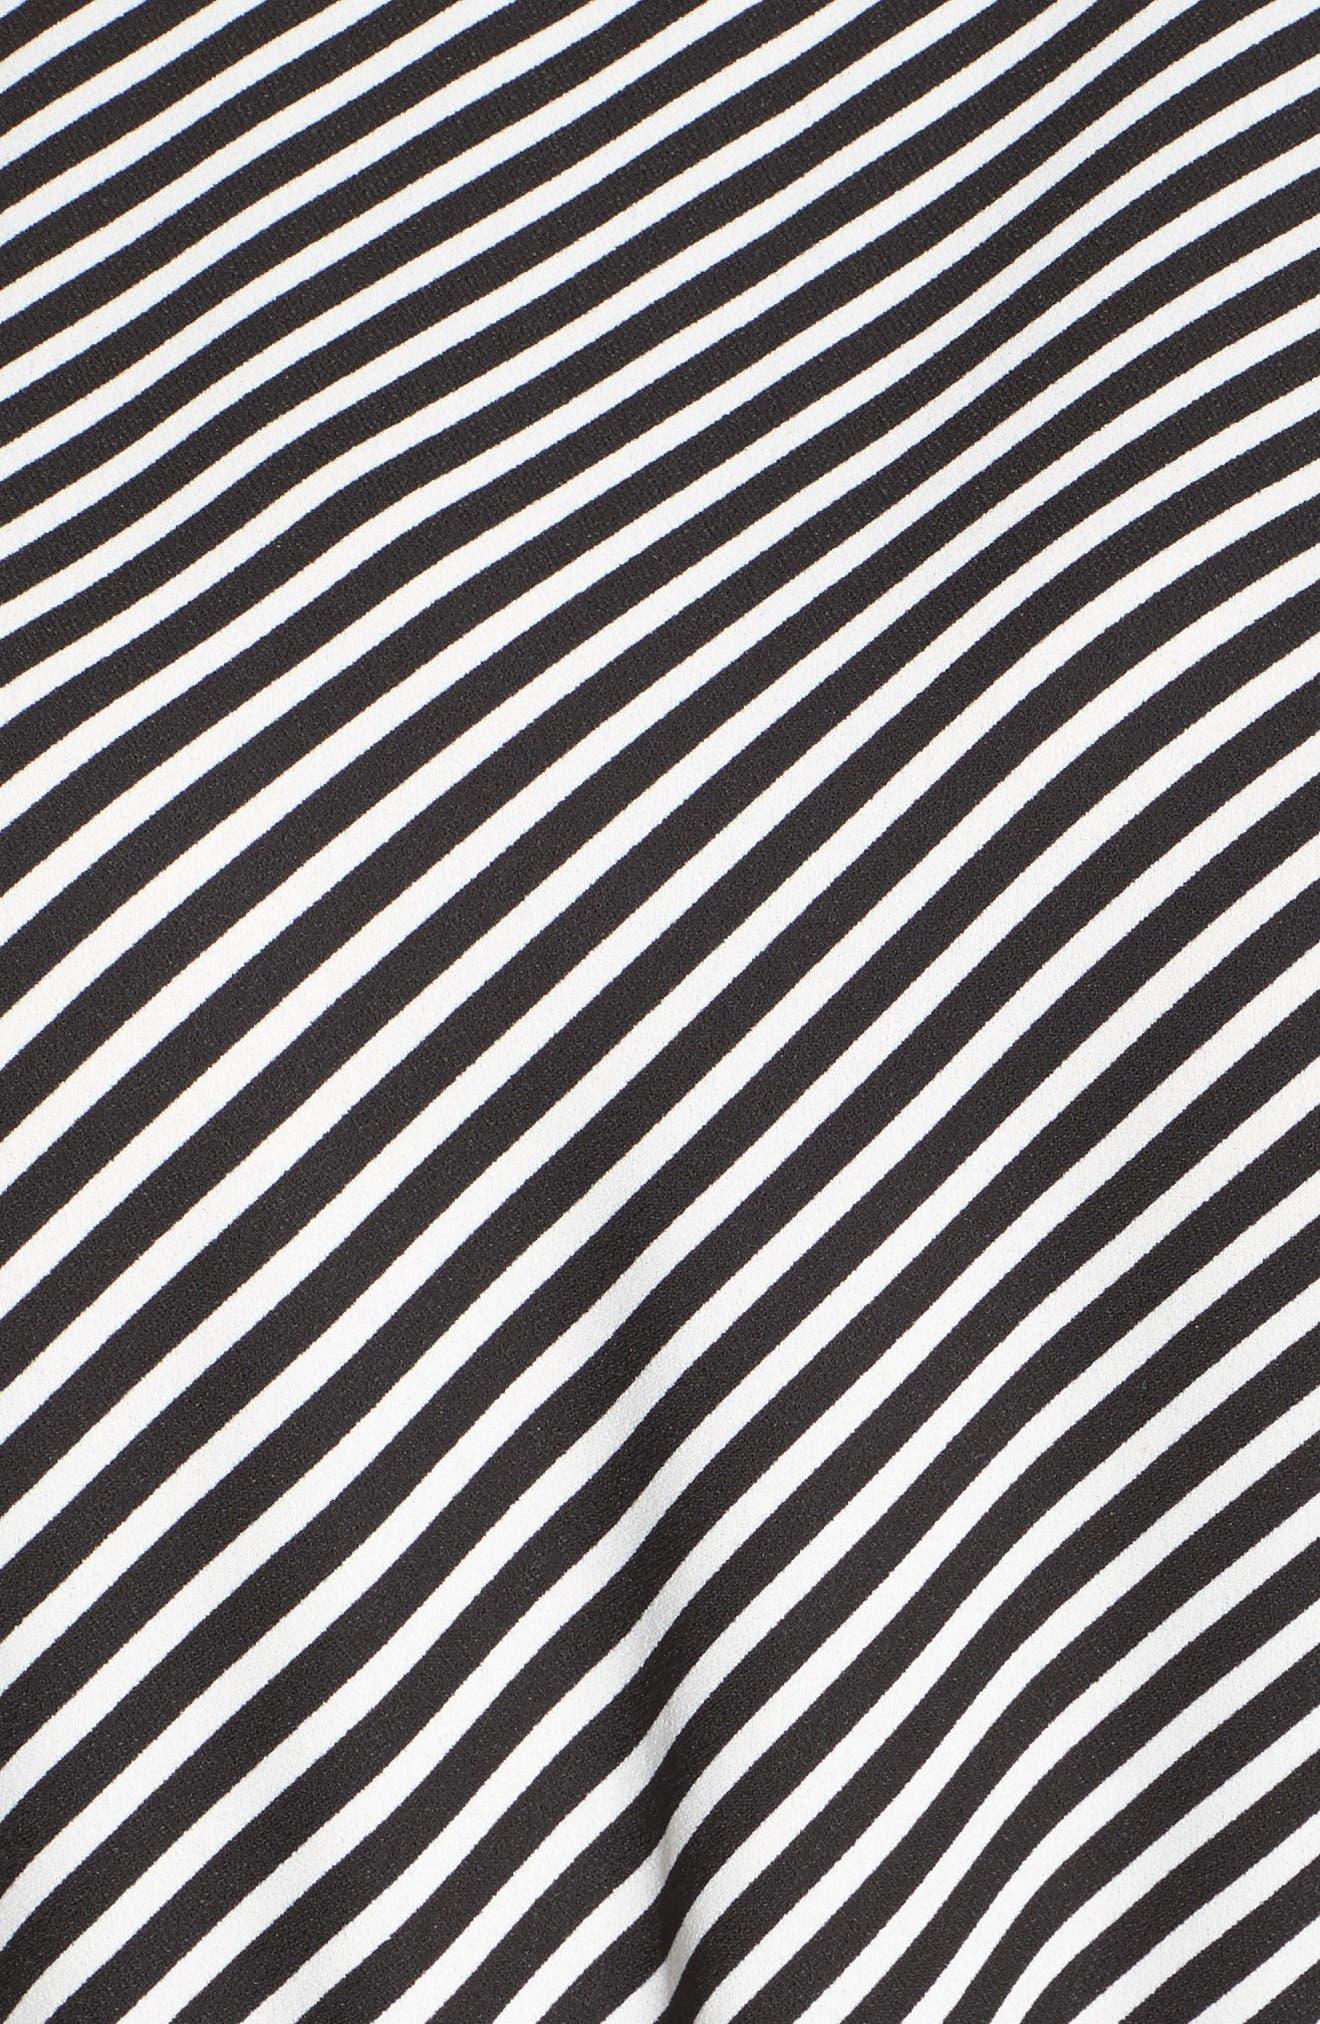 Diagonal Stripe Belted Jumpsuit,                             Alternate thumbnail 5, color,                             006